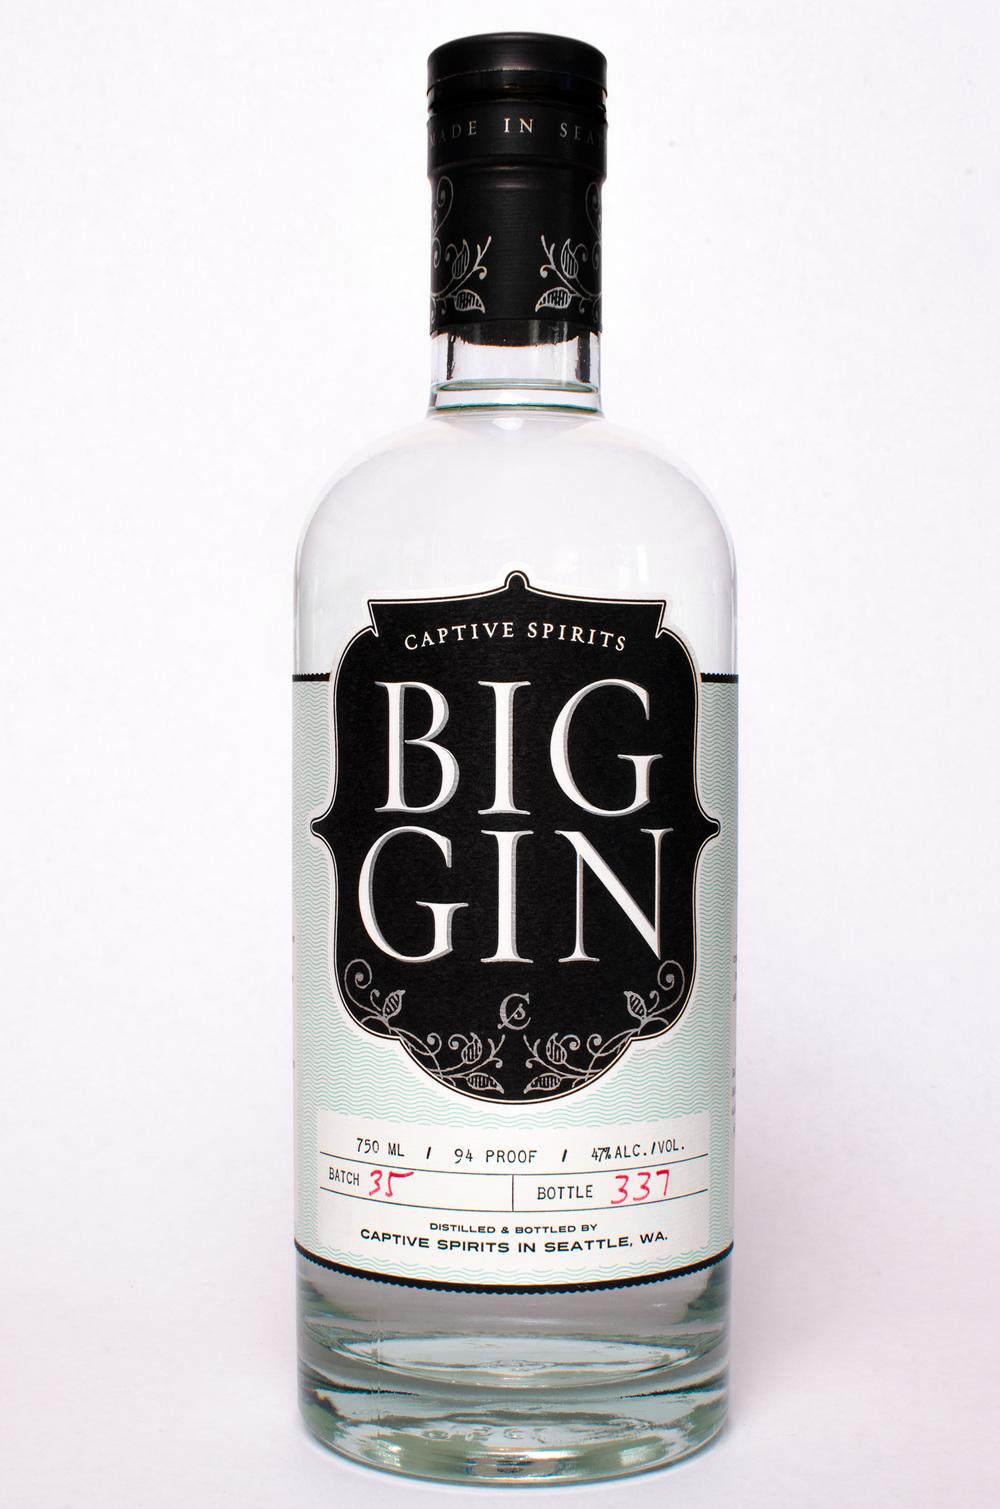 Big-Gin-Bottle-2-Small.jpg